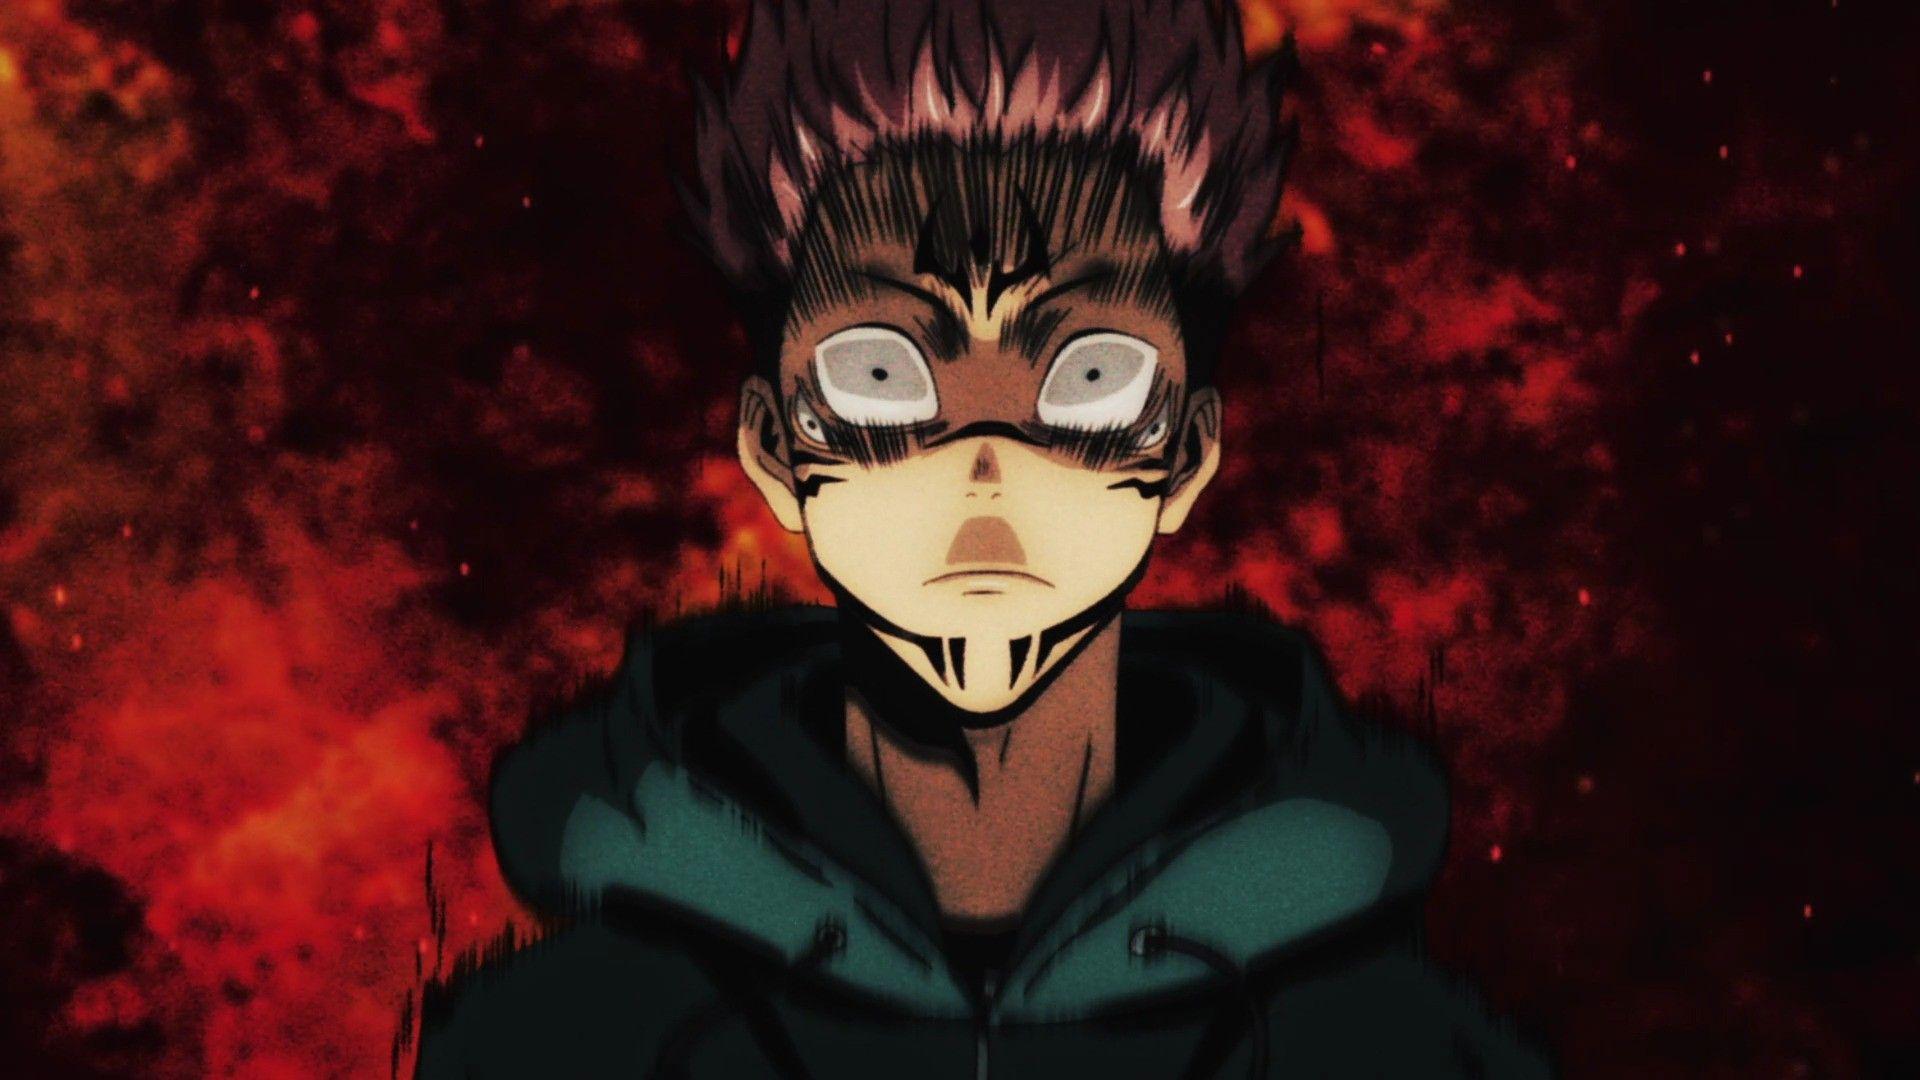 Wallpaper Anime Jujutsu Kaisen - Animeindo